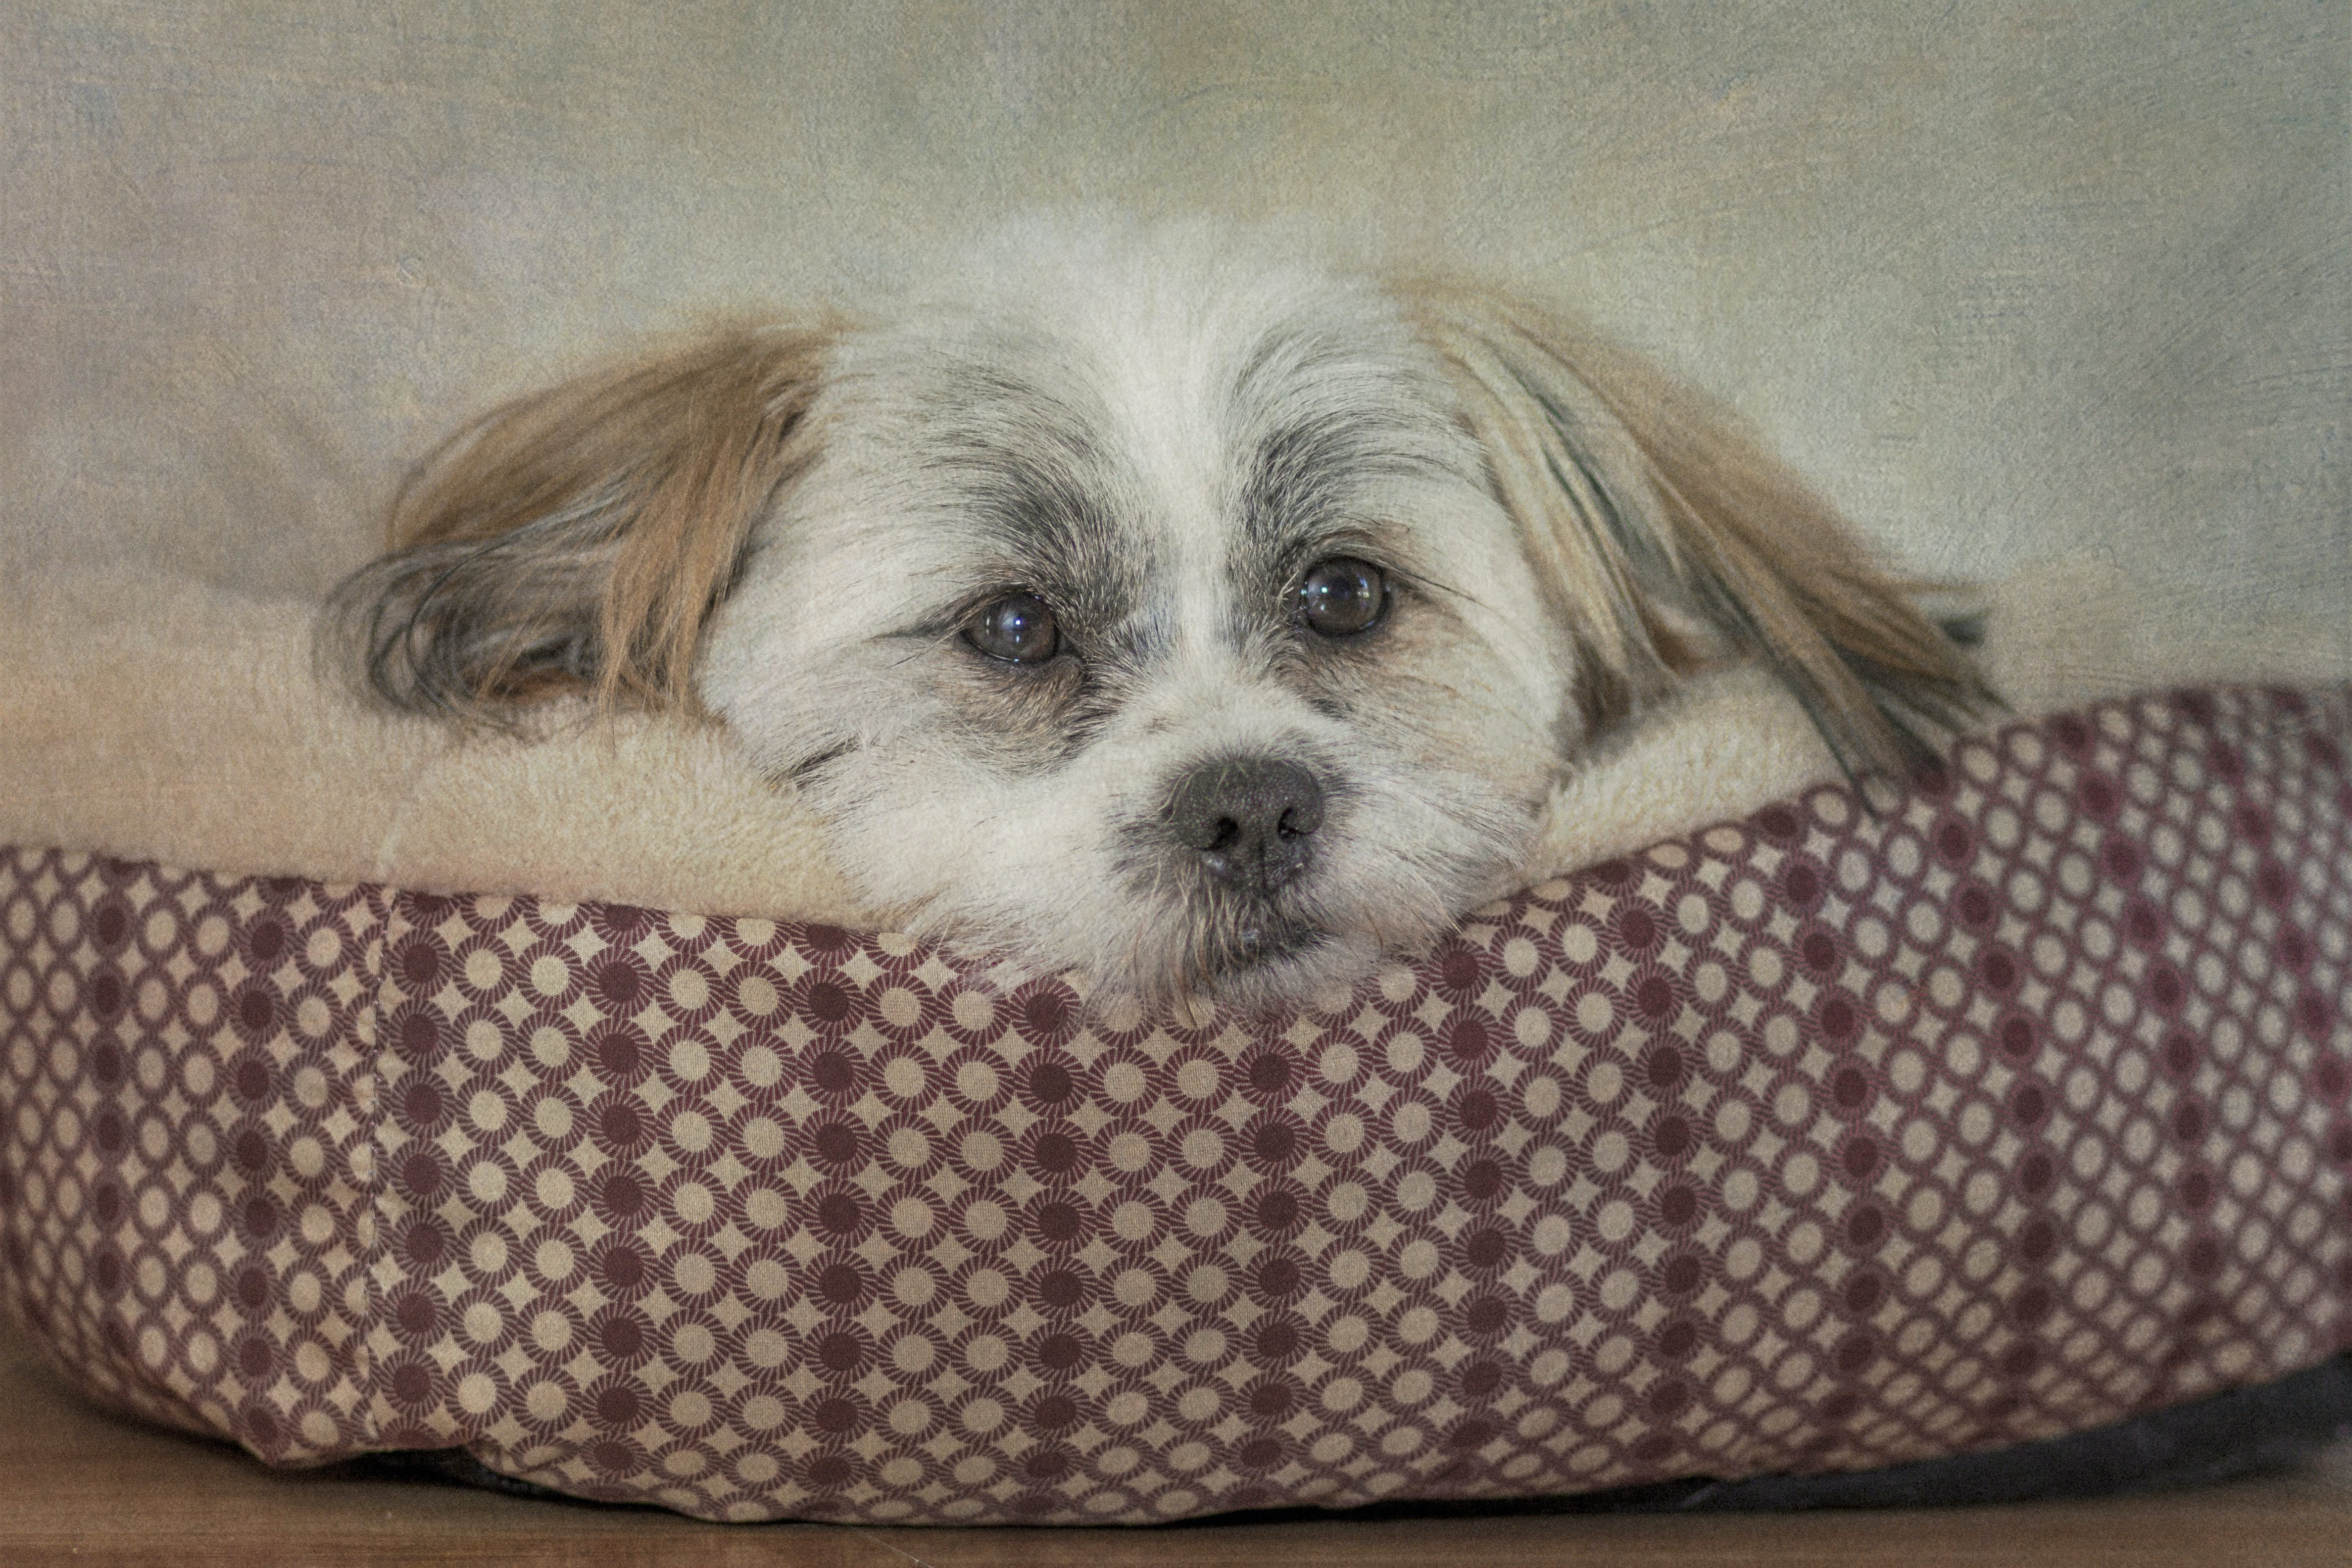 Free stock photo of puppy dog